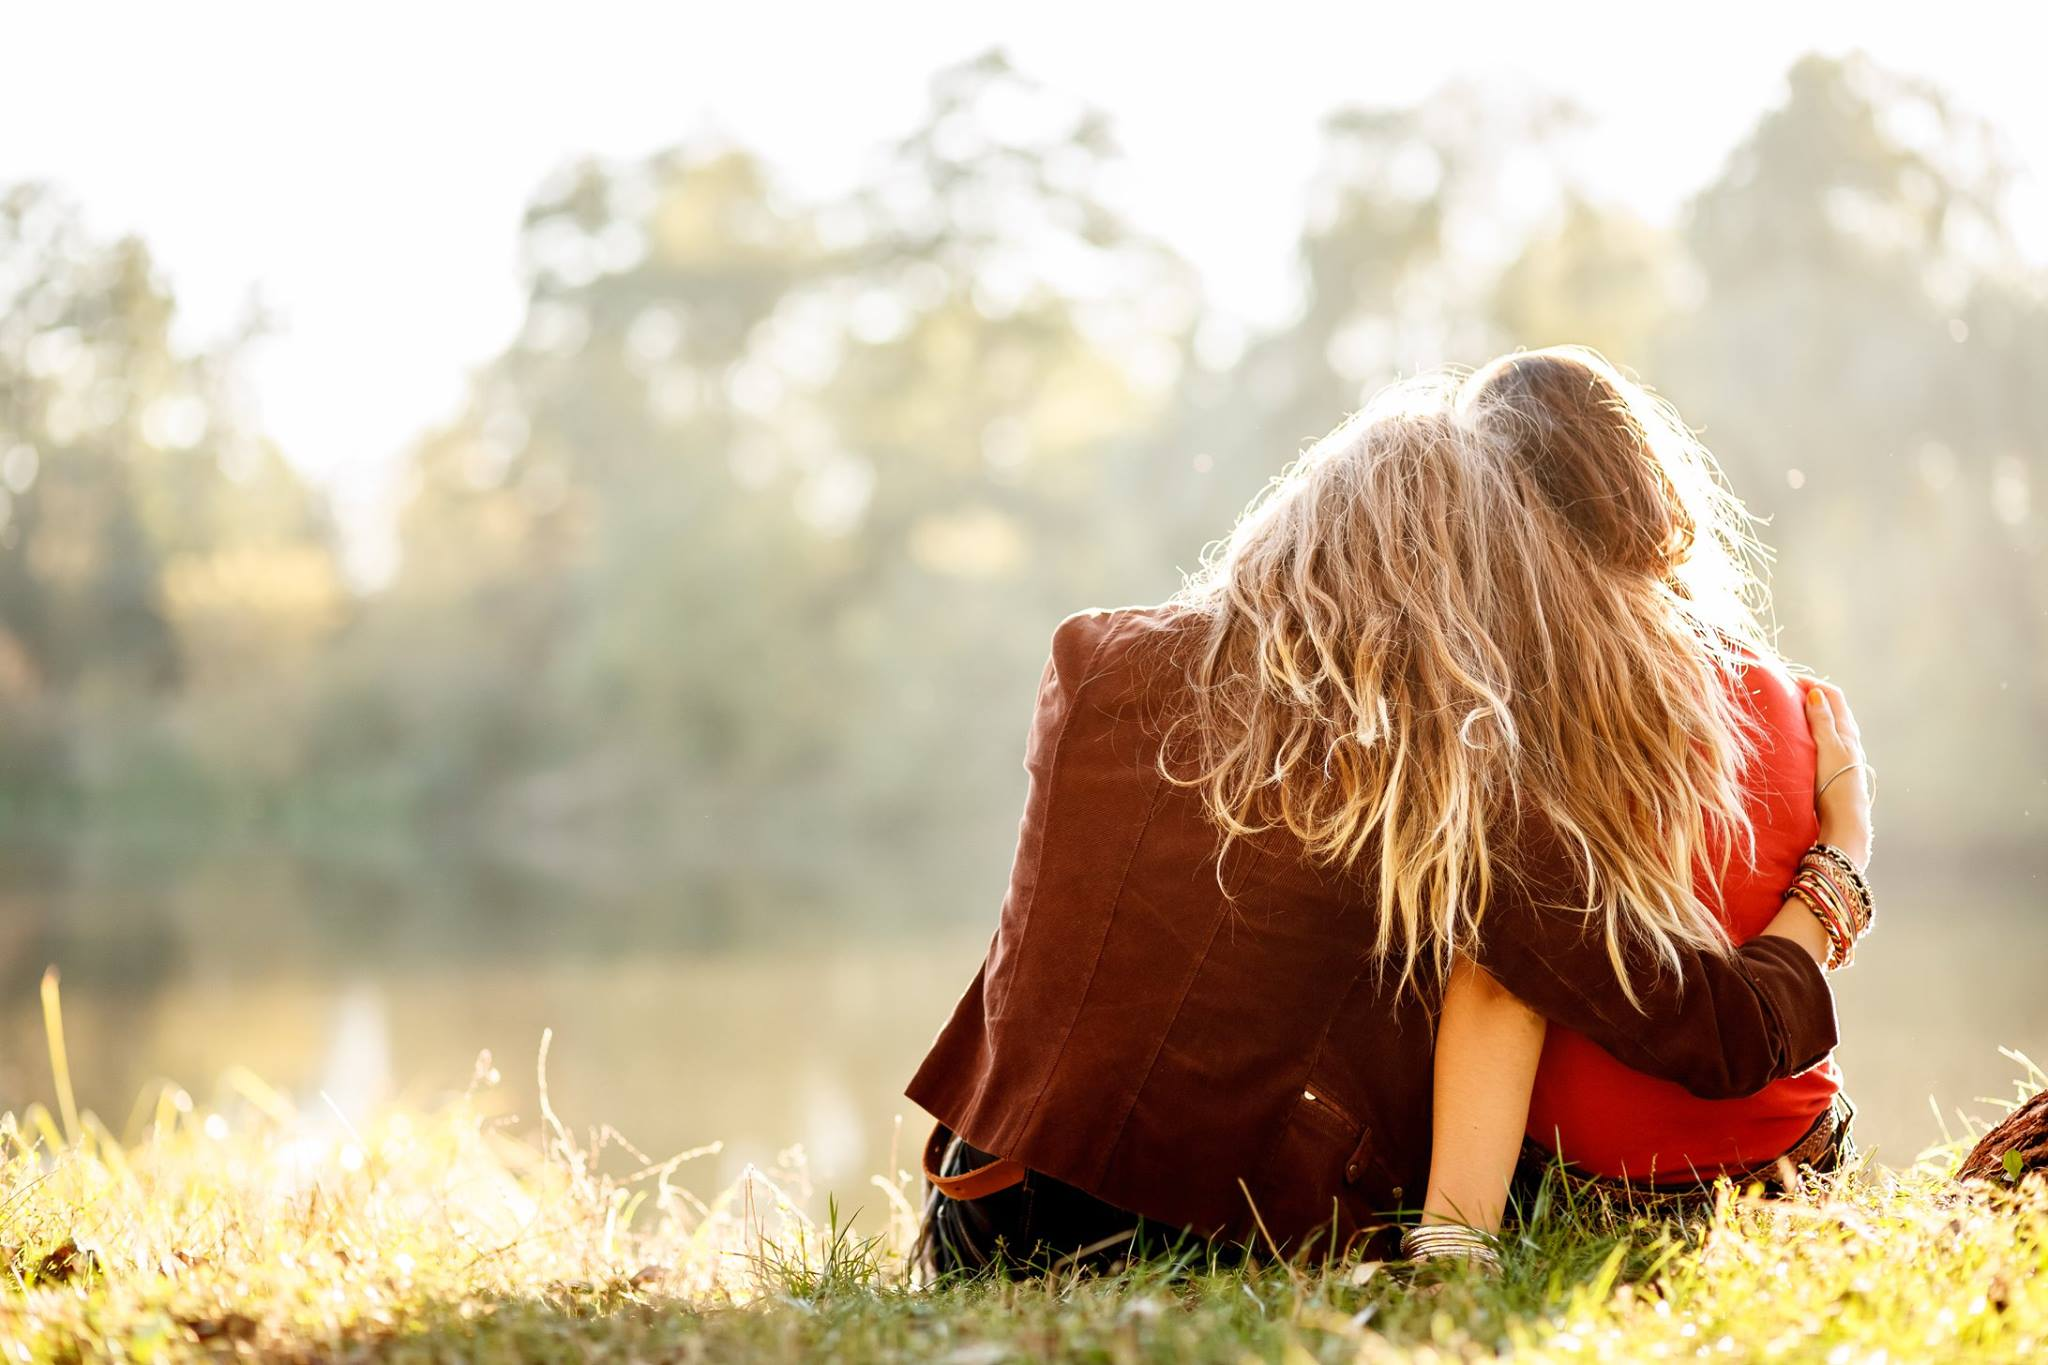 meditation online class Carlisle, loving kindness